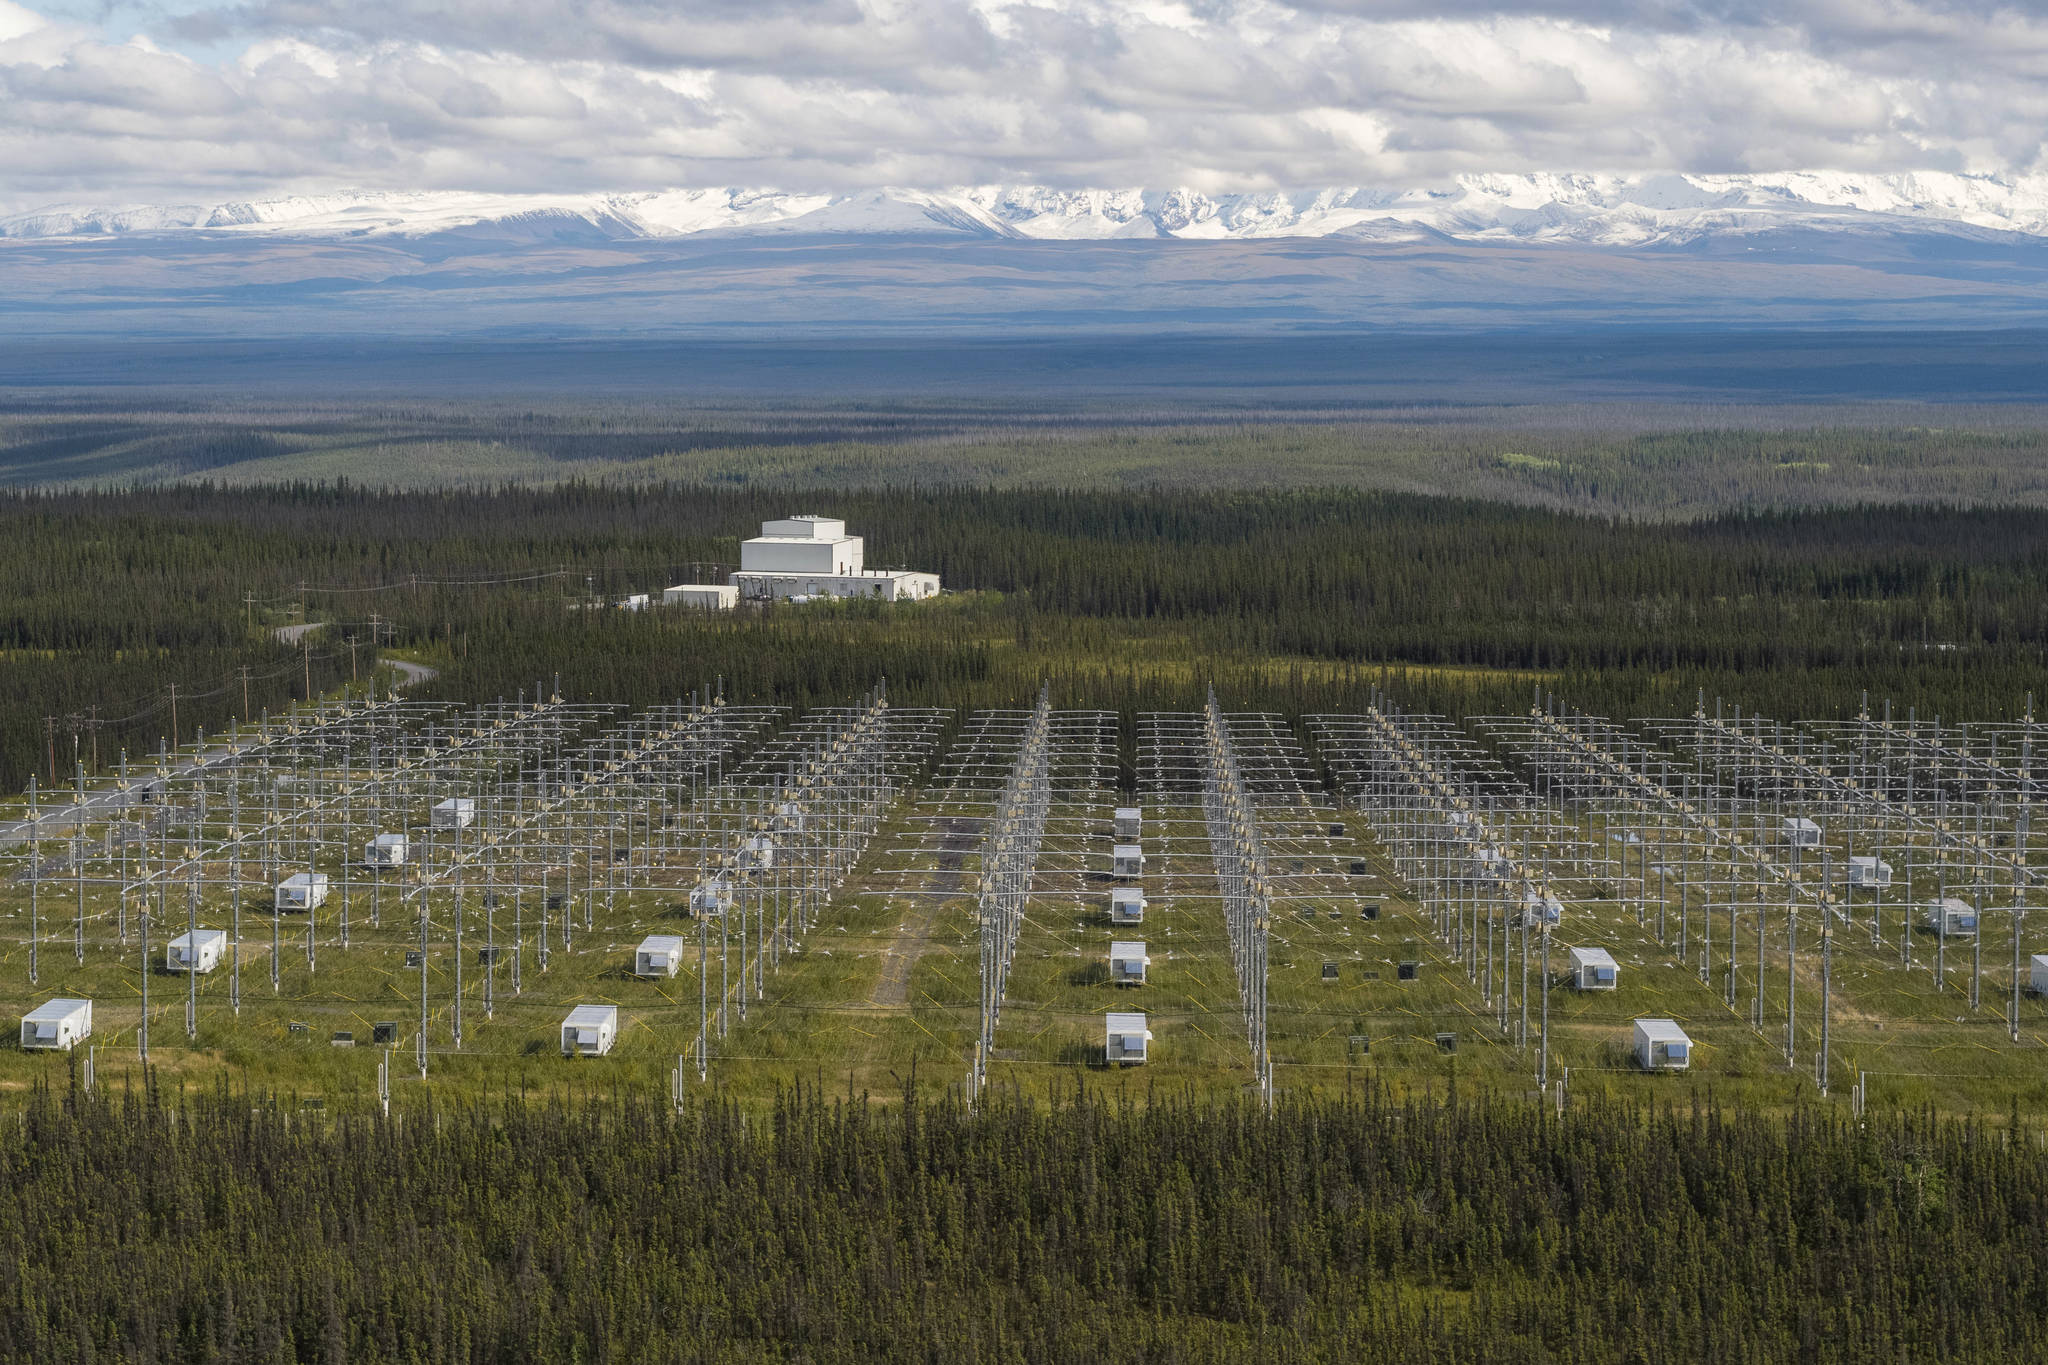 HAARP — Scientific facility, Alaska, United States